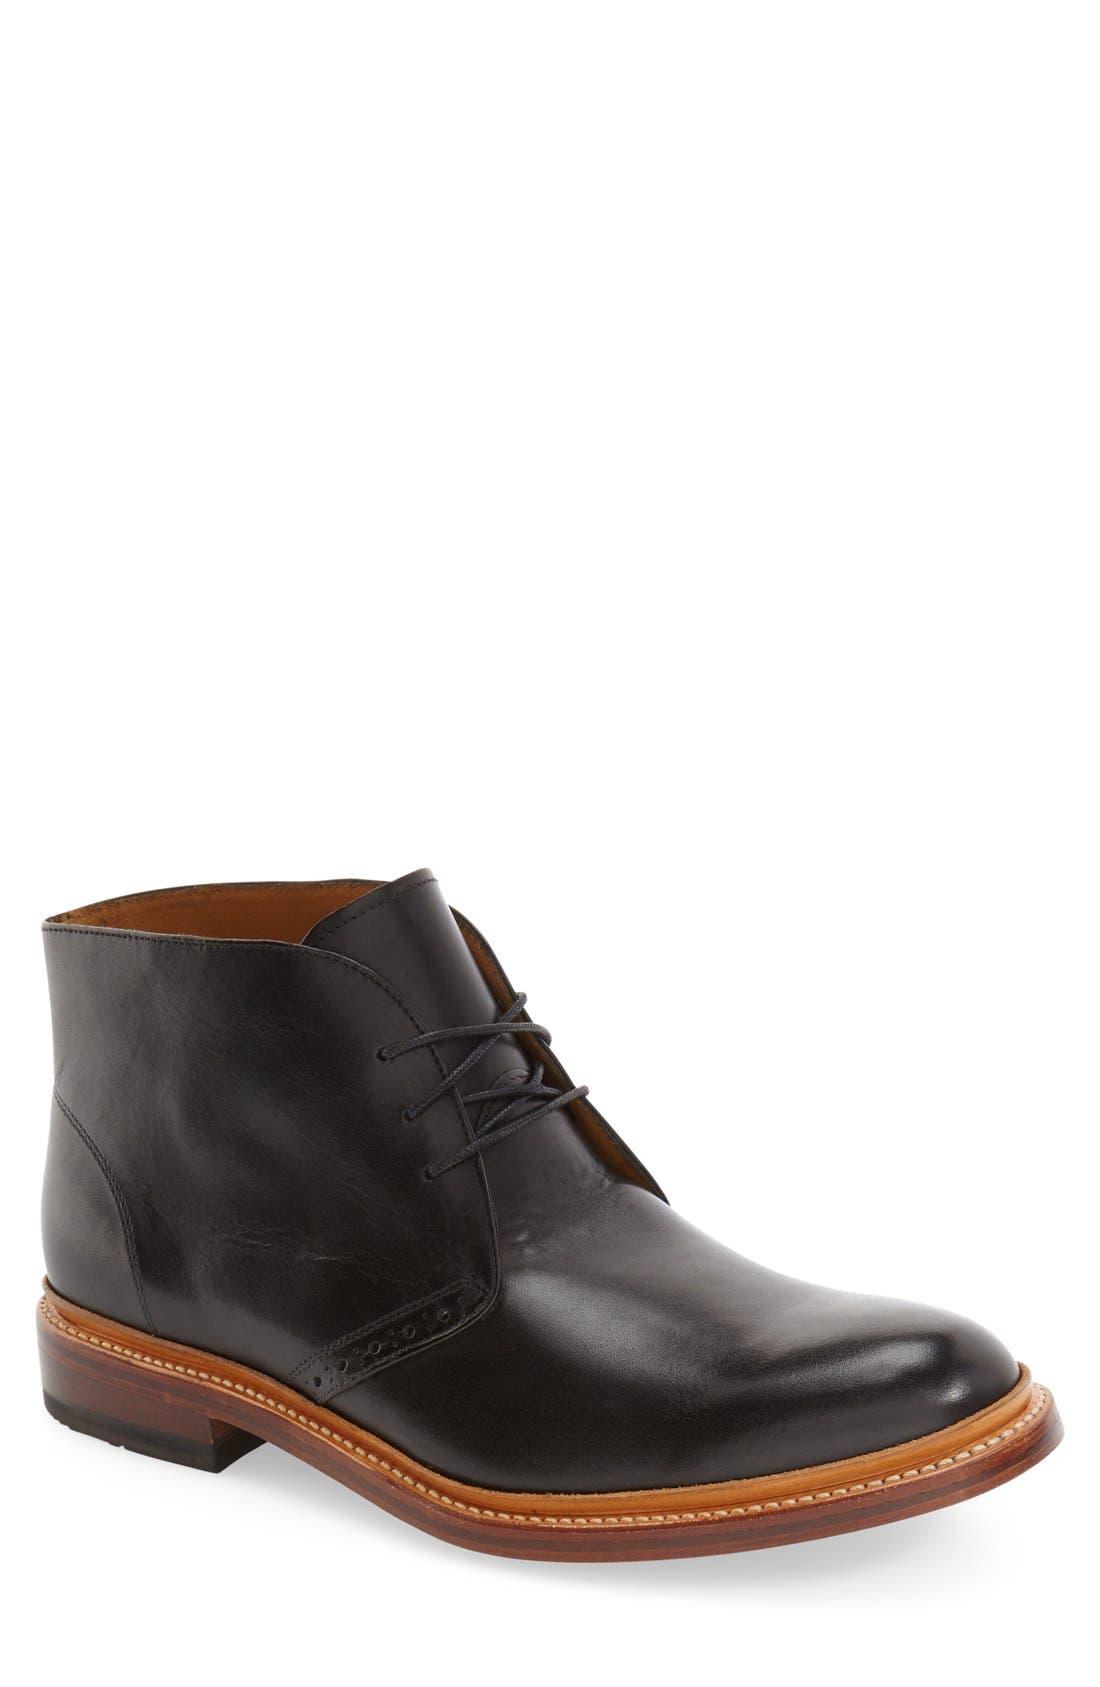 'Madison II' Chukka Boot,                             Main thumbnail 1, color,                             Black Smooth Leather